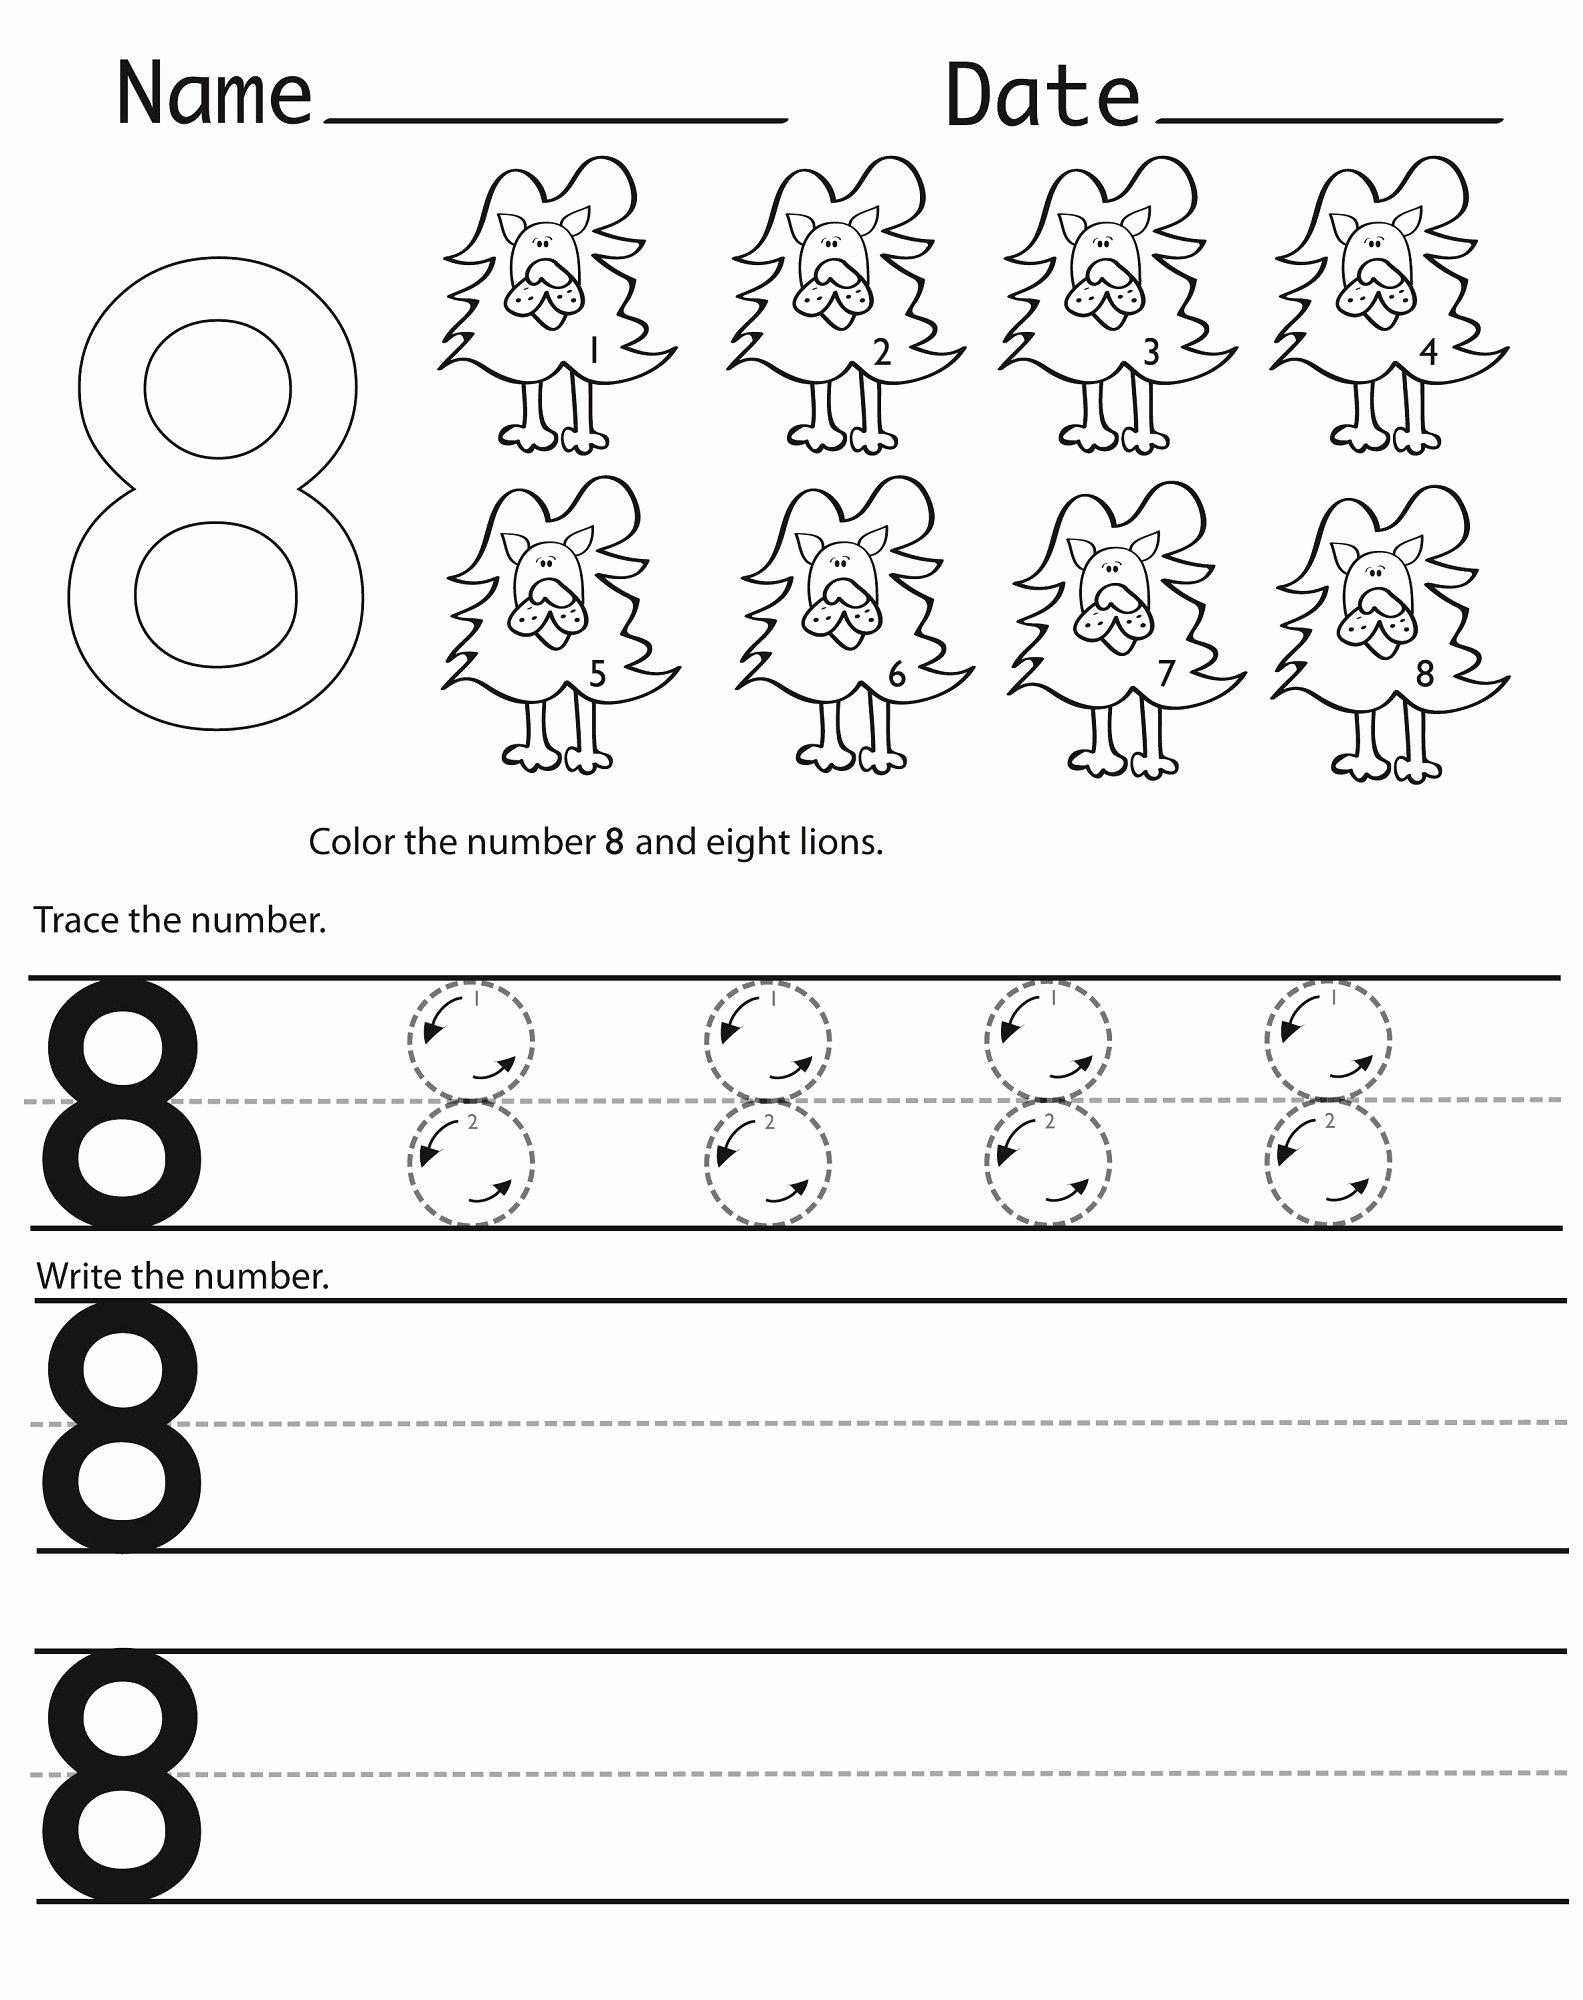 Number 8 Worksheets for Preschoolers New Number 8 Worksheets Printable